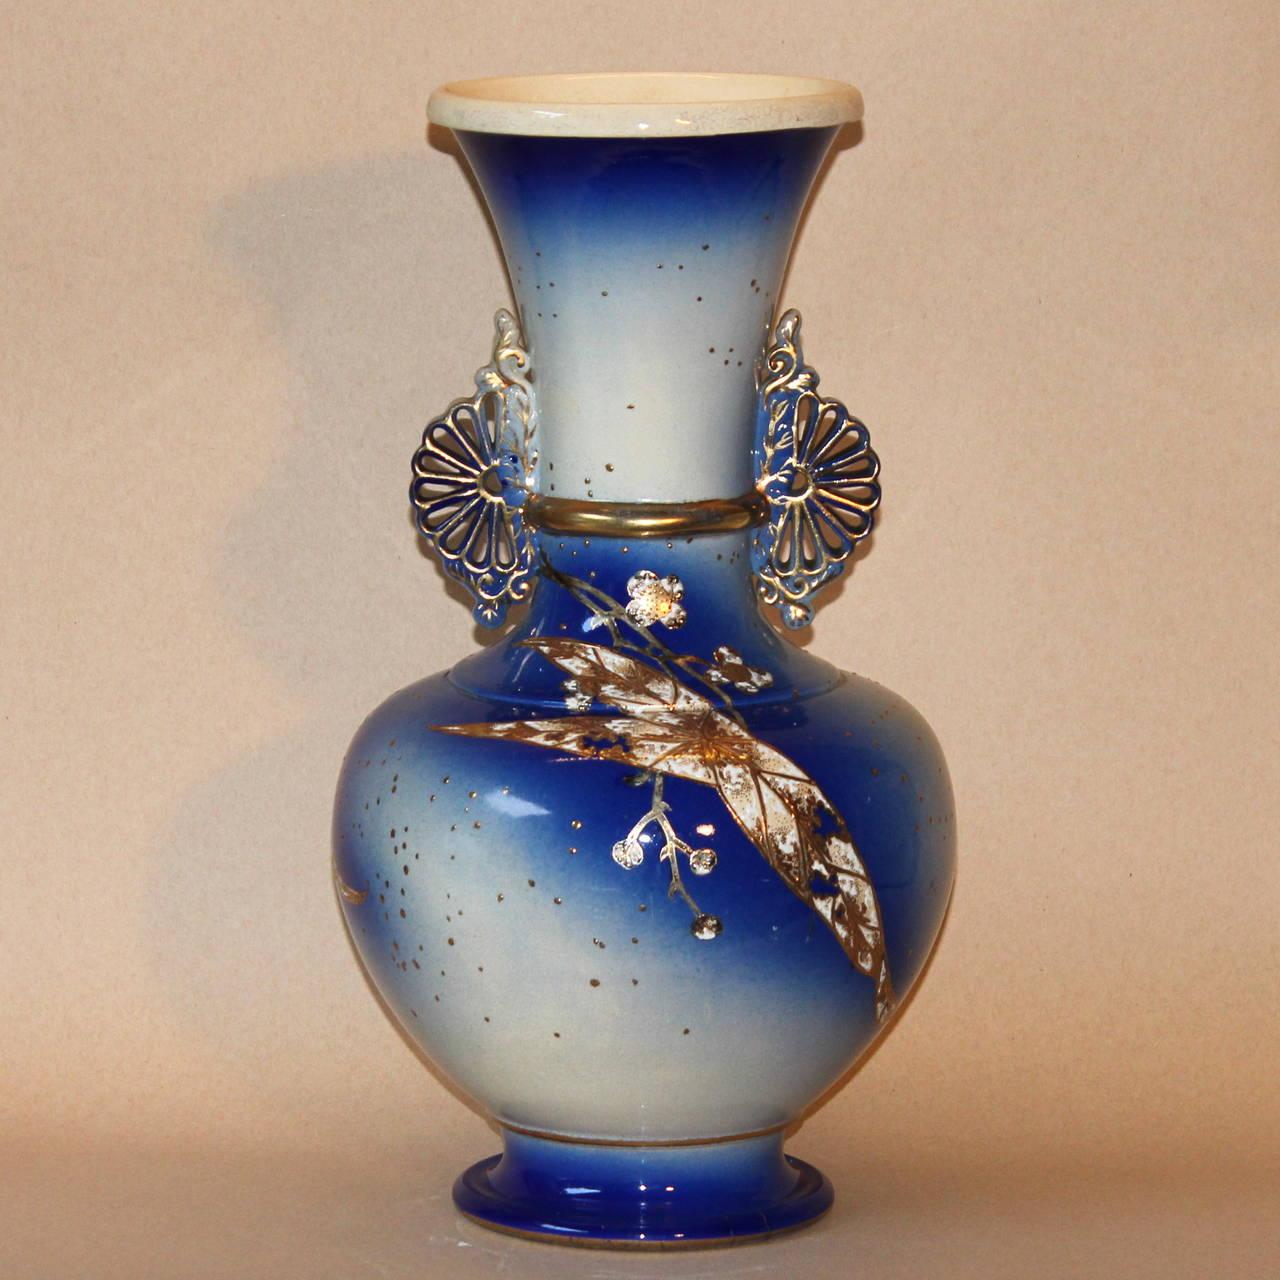 Antique japanese kinkozan satsuma studio art deco pottery vase at large satsuma vase decorated with lily leaves in extraordinary detail with bright blue glaze beautiful reviewsmspy